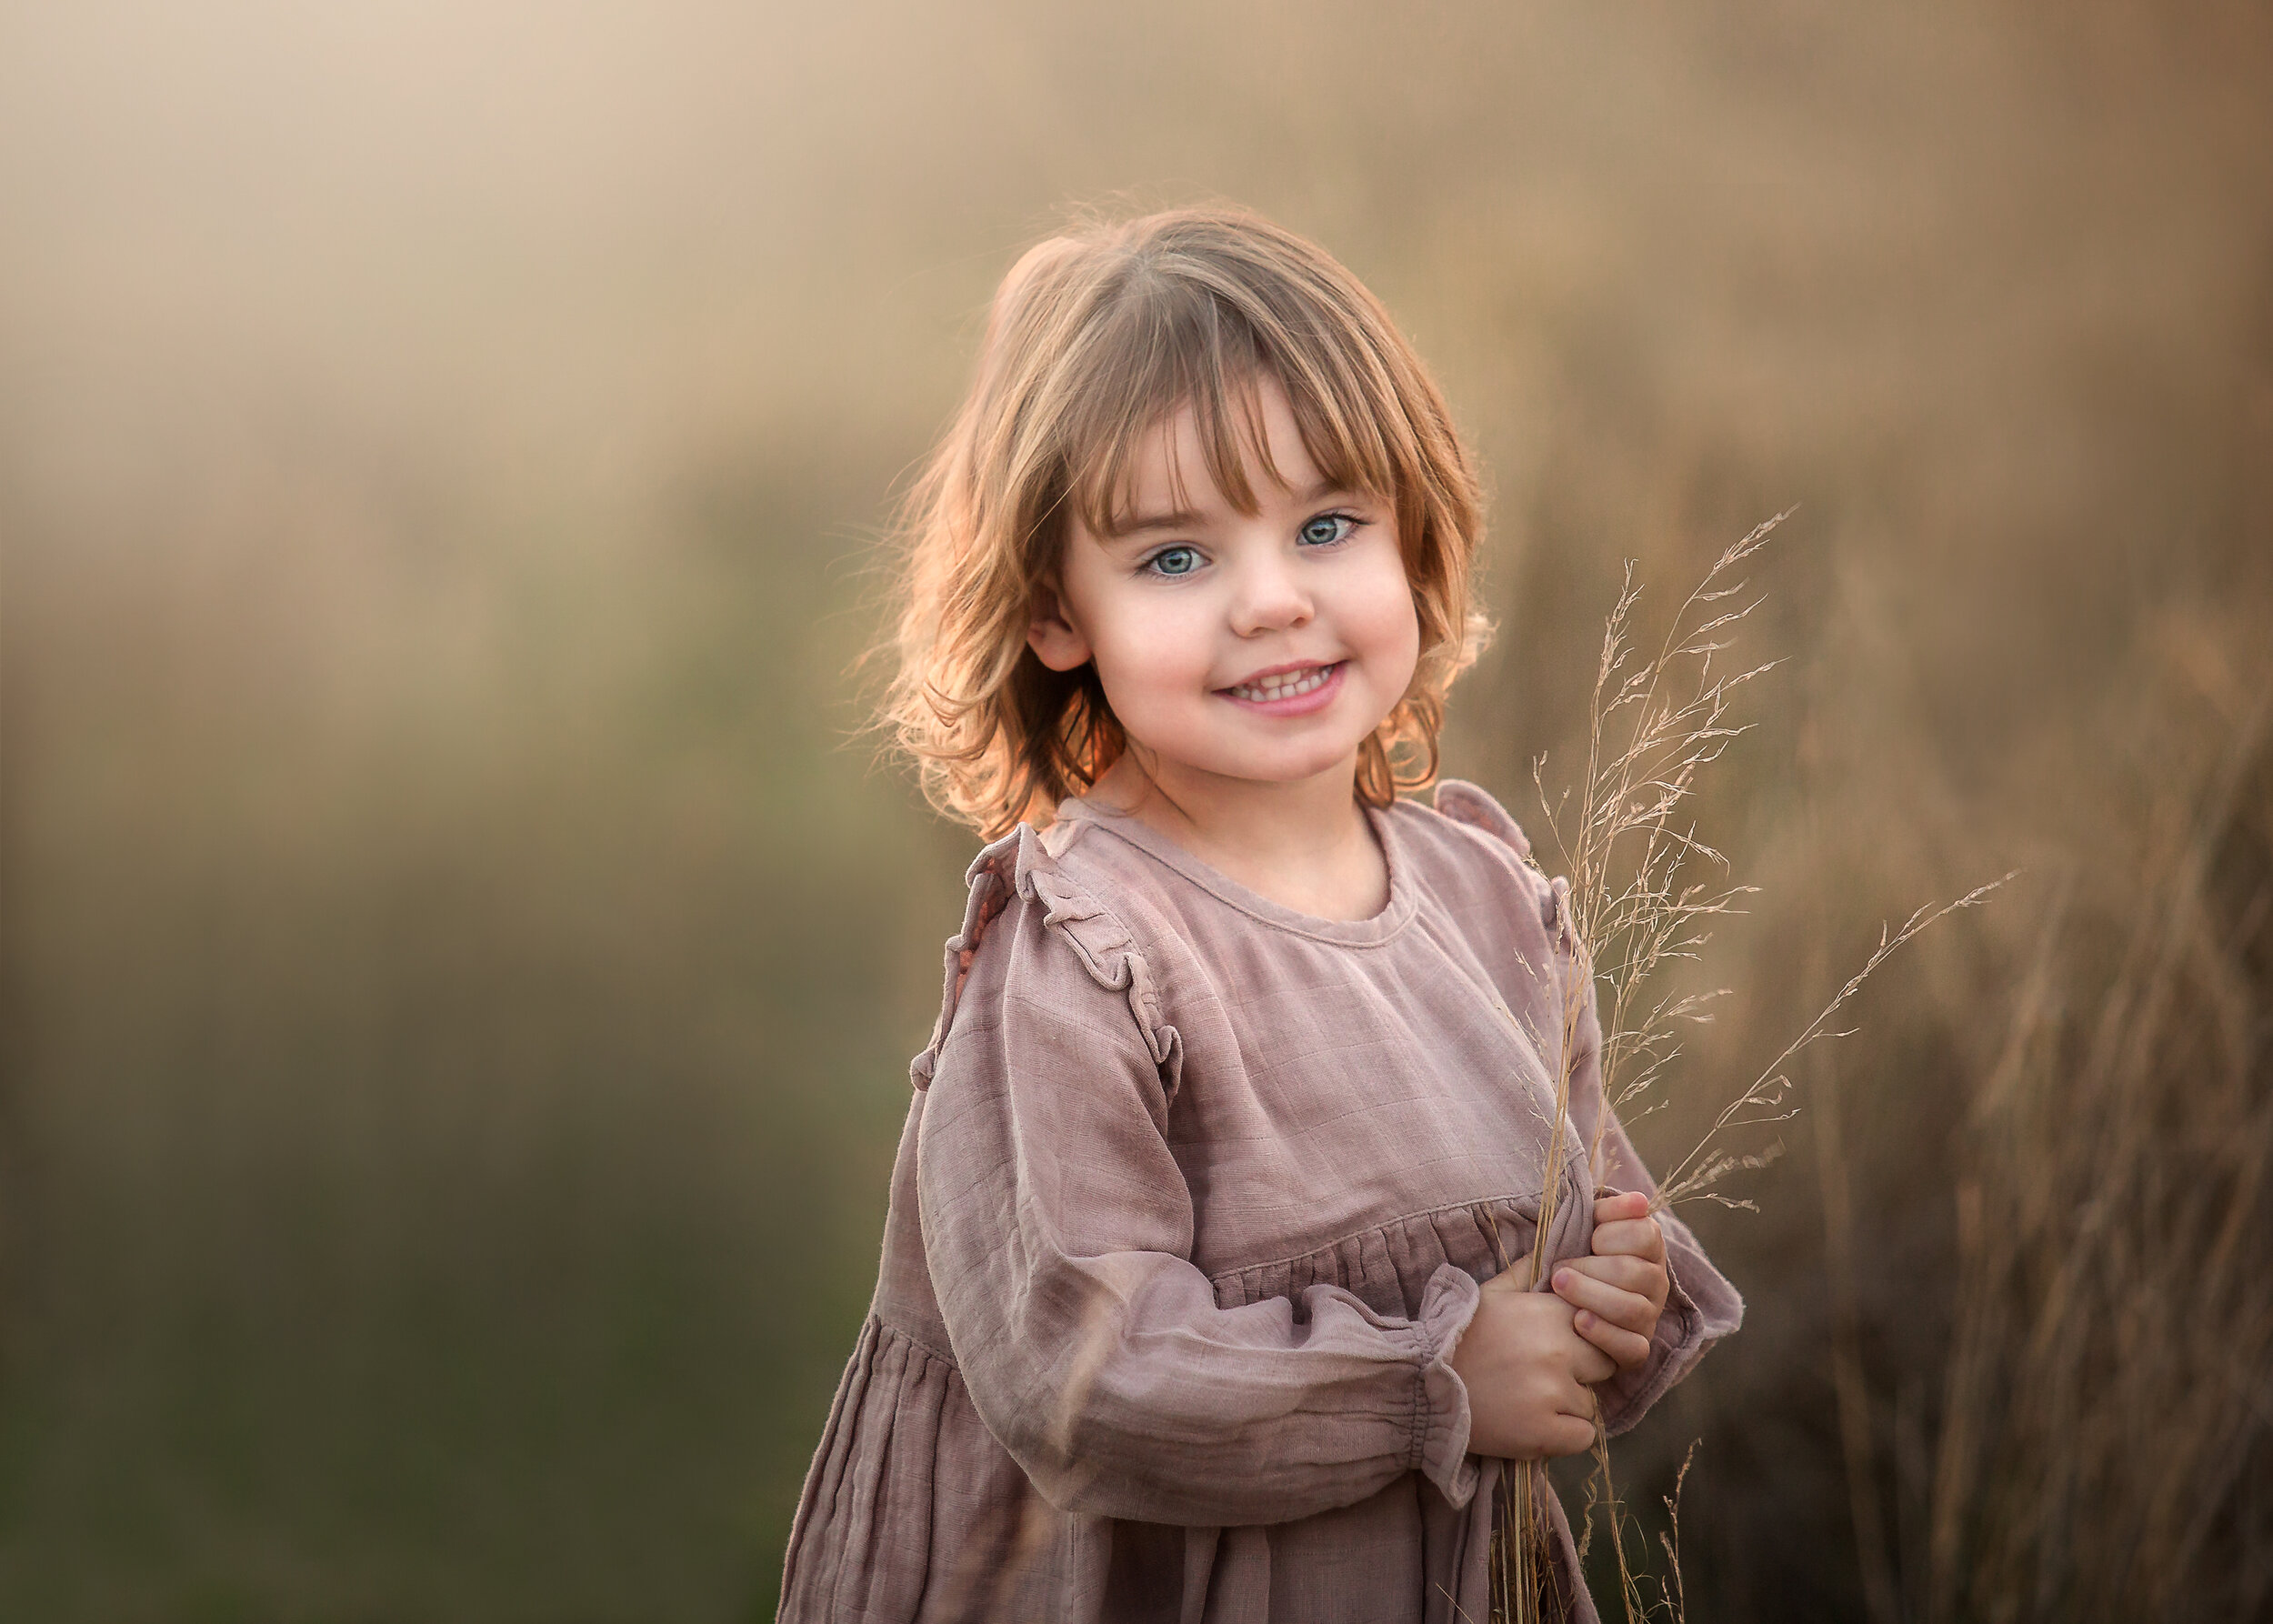 Michelle-Petkovic-Photography-3.jpg